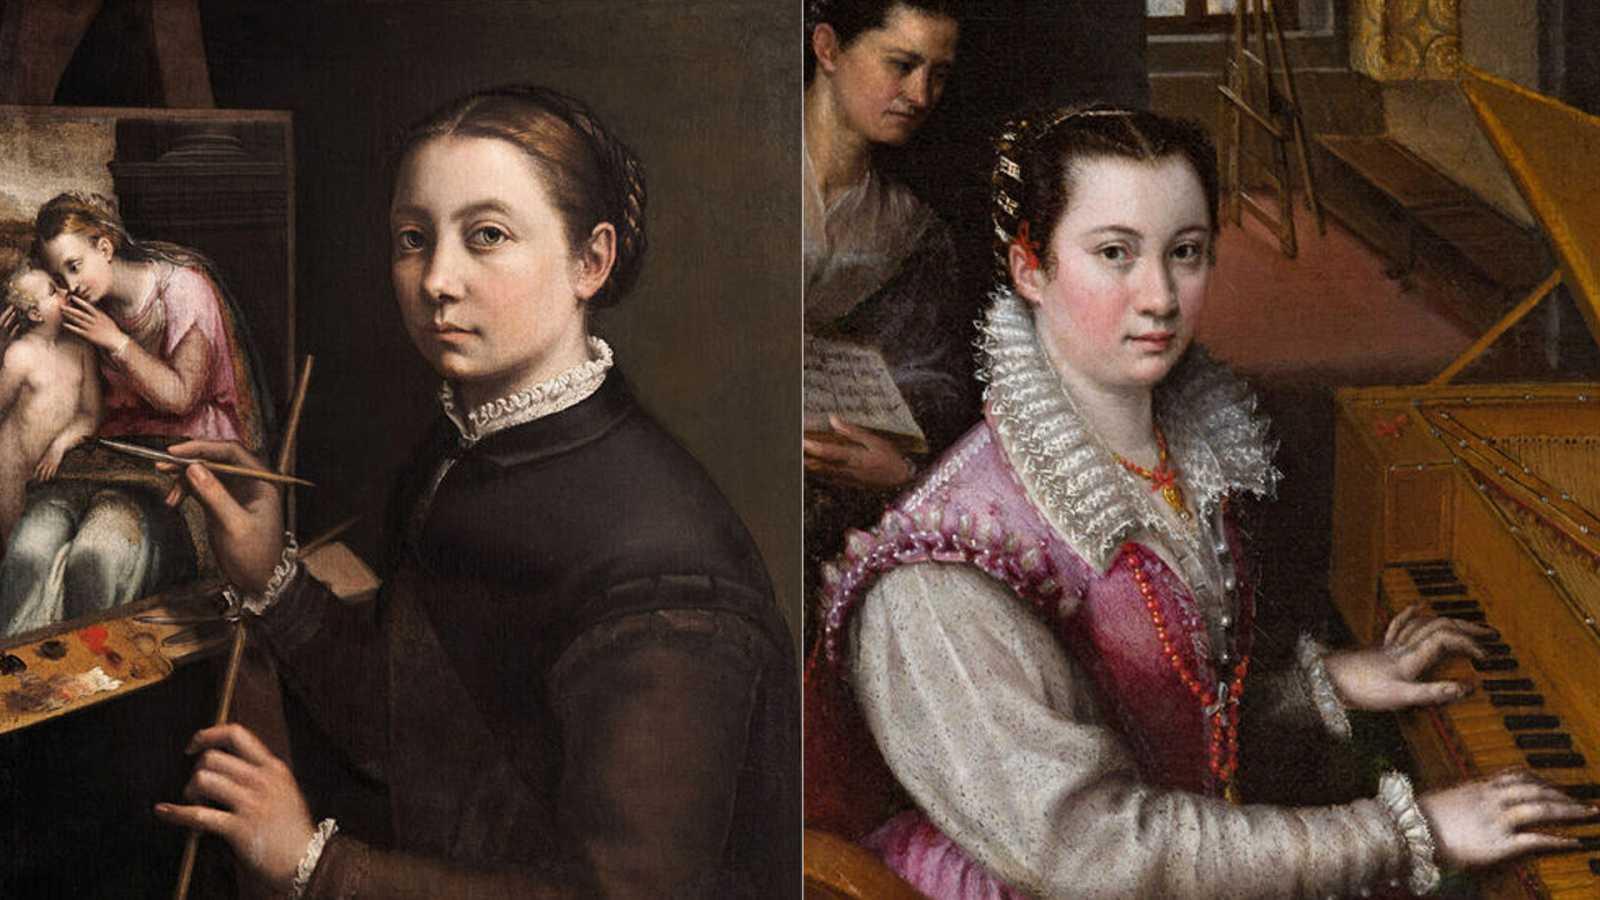 Sofonisba Anguissola y Lavinia Fontana (de izda. a dcha.)